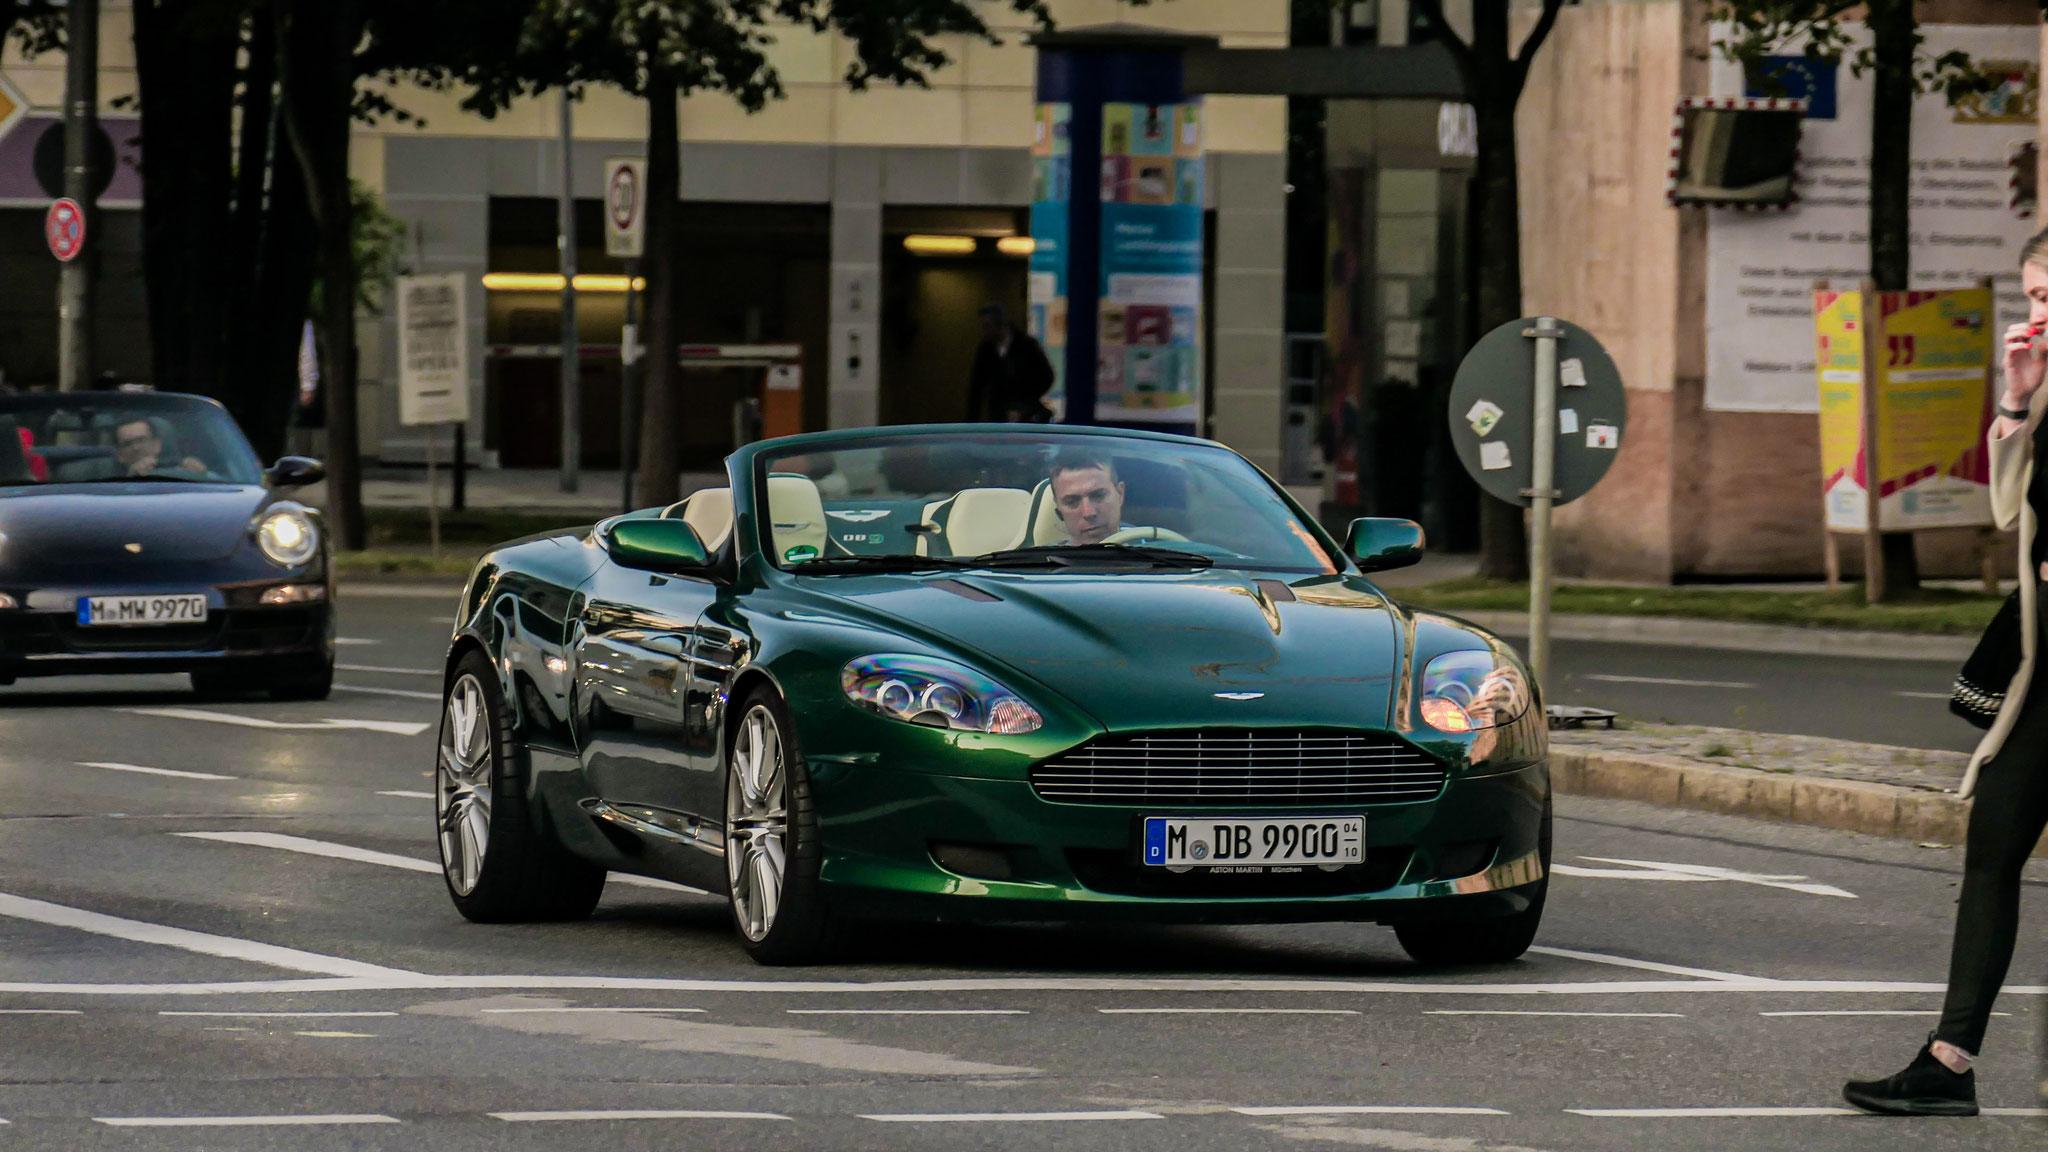 Aston Martin DB9 GT Volante - M-DB-9900